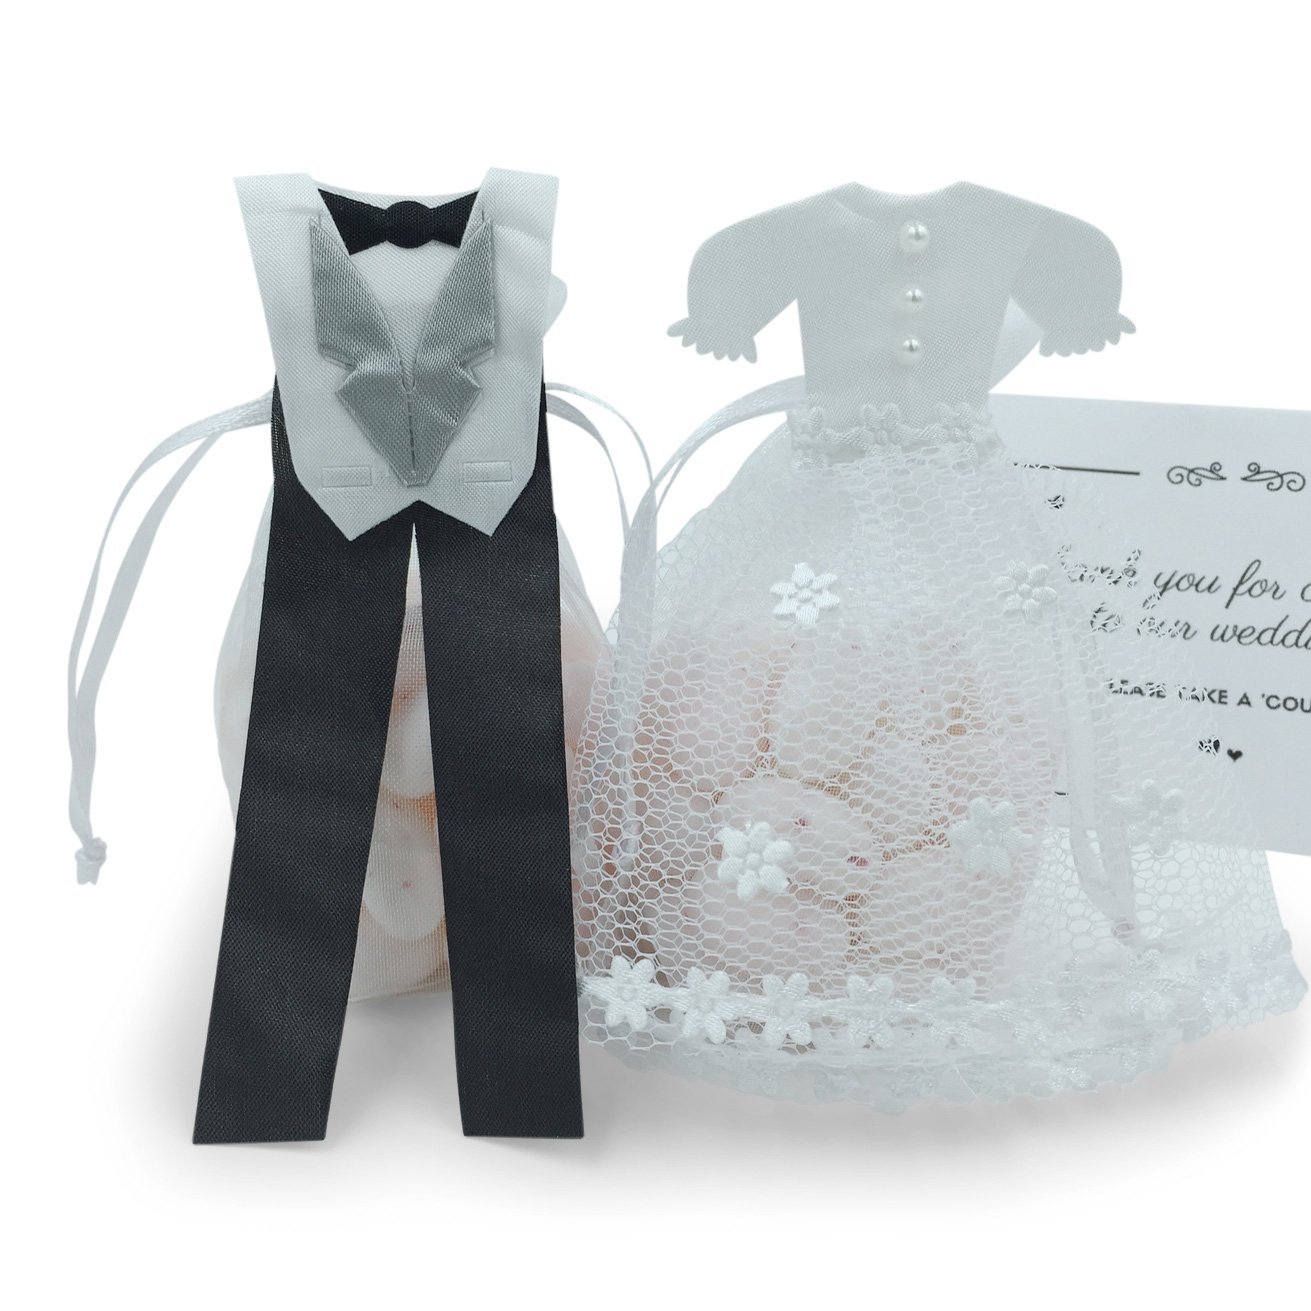 Amazon.com: Pardao Bride & Groom Wedding Favor Bags - Thank You ...